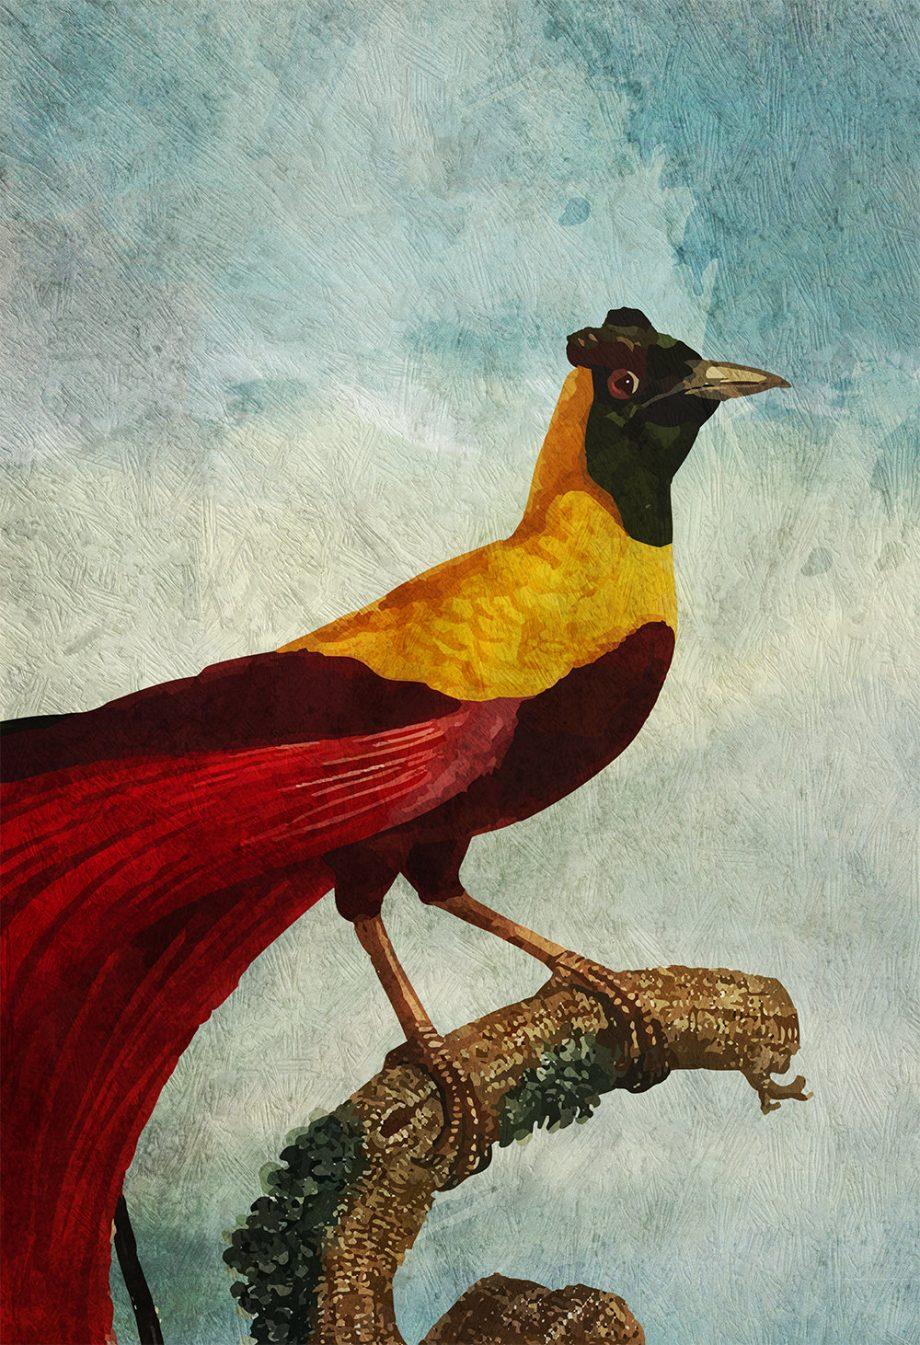 Vintage Bird of Paradise Print Antique Bird Print Vintage Bird Prints Illustrated Bird Print Bird Wall Decor Natural History Wall Art